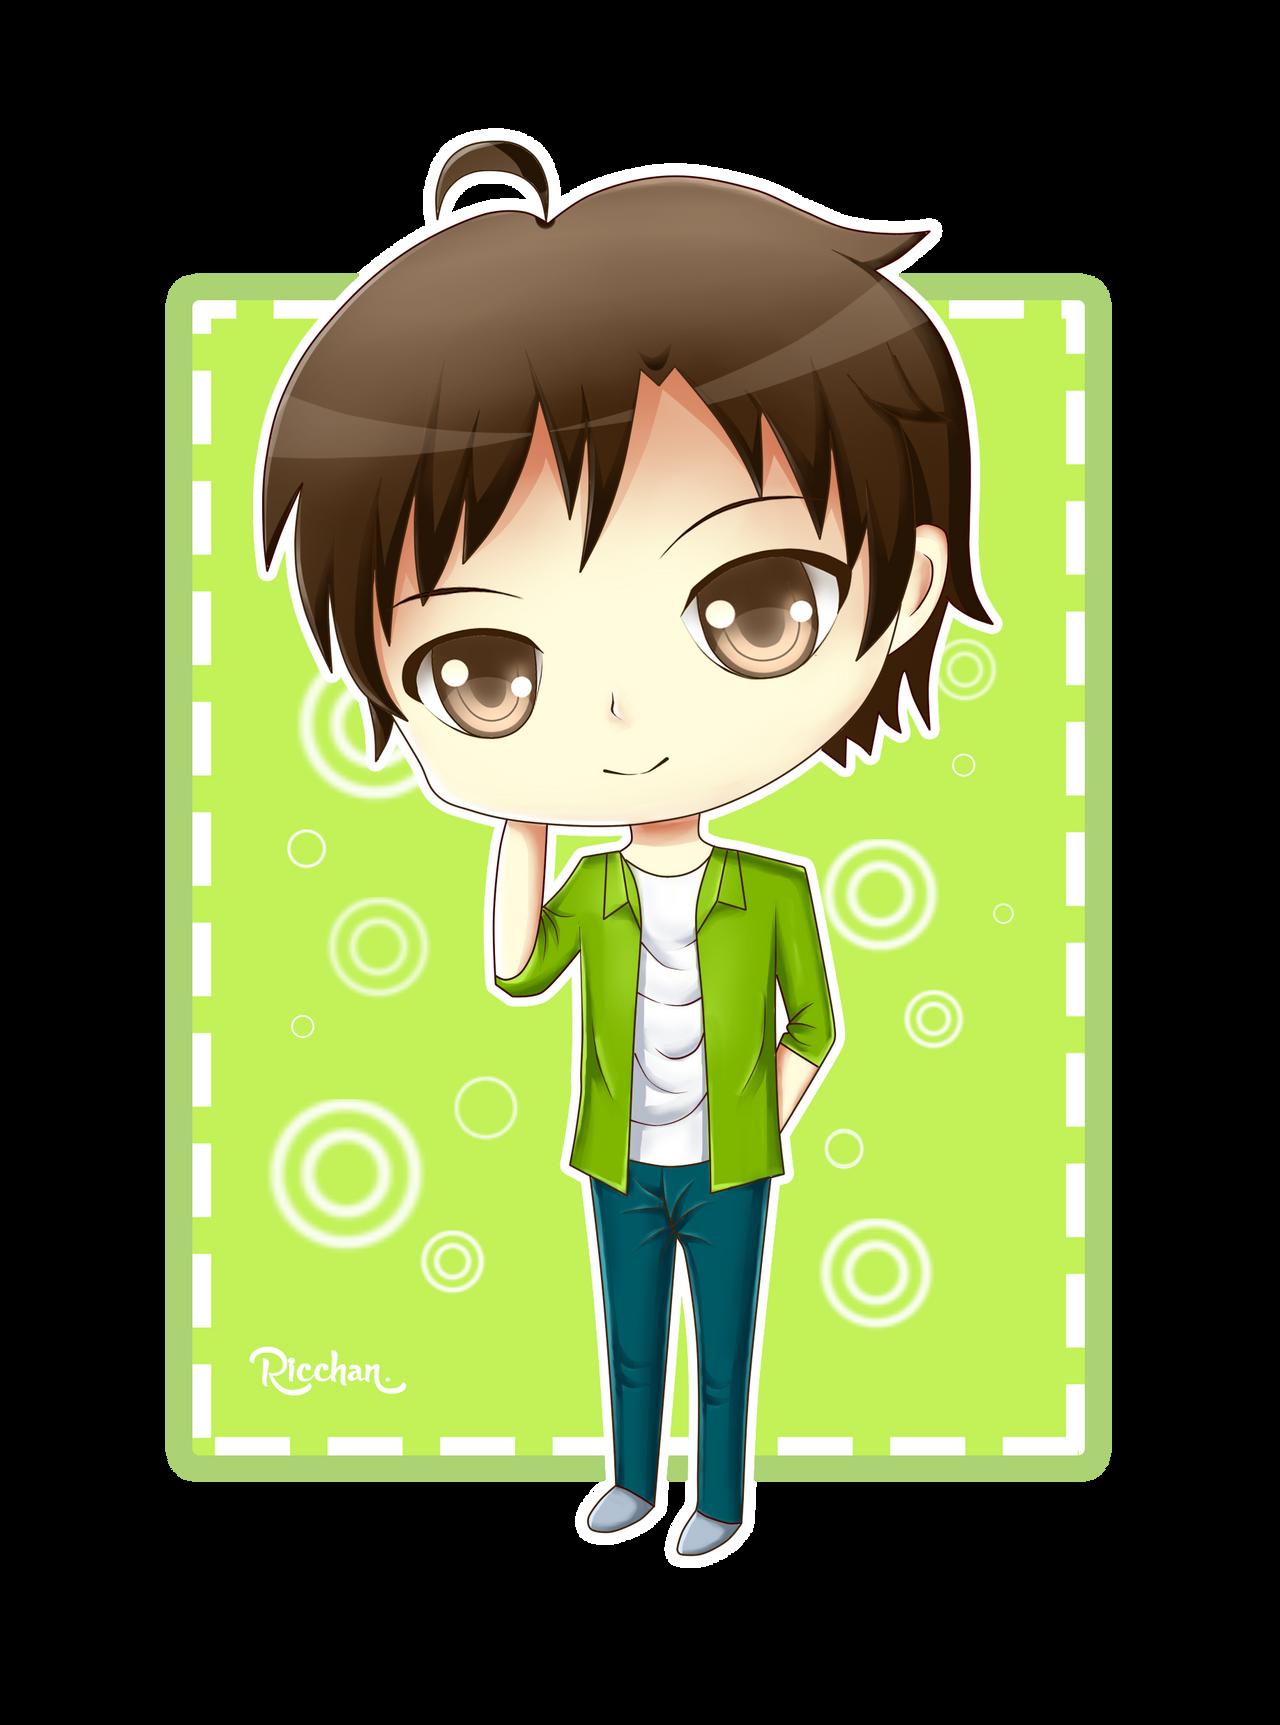 Chibi Onii Chan By Ricchan08